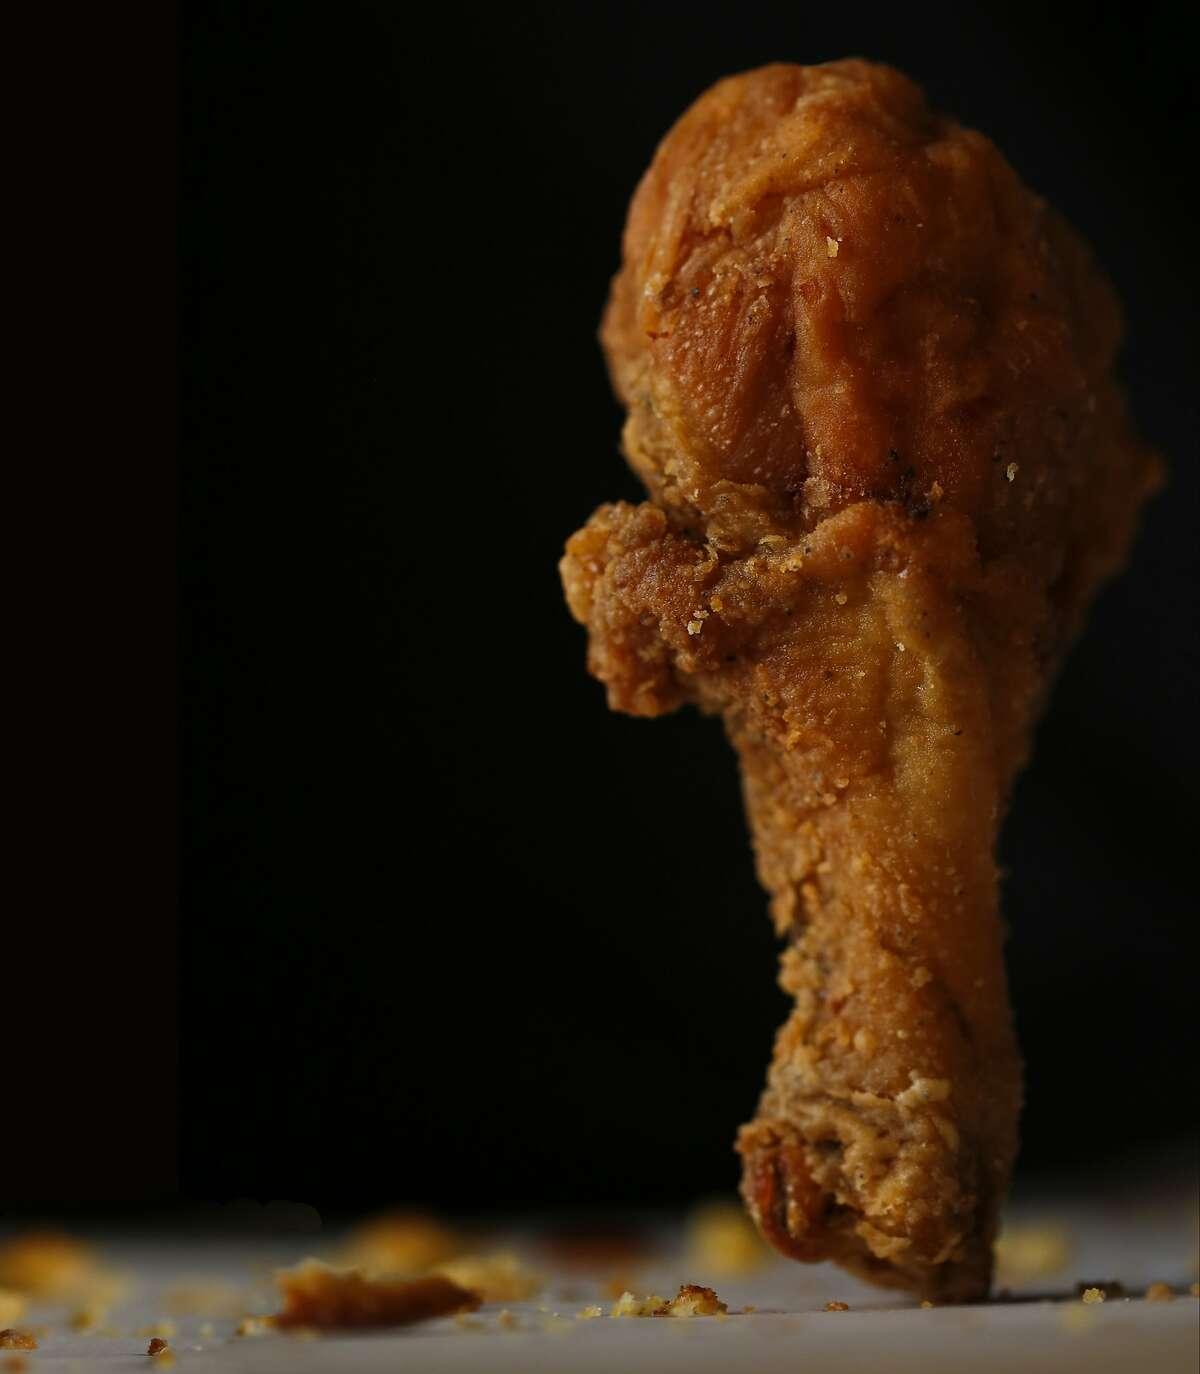 Frisco Fried fried chicken.